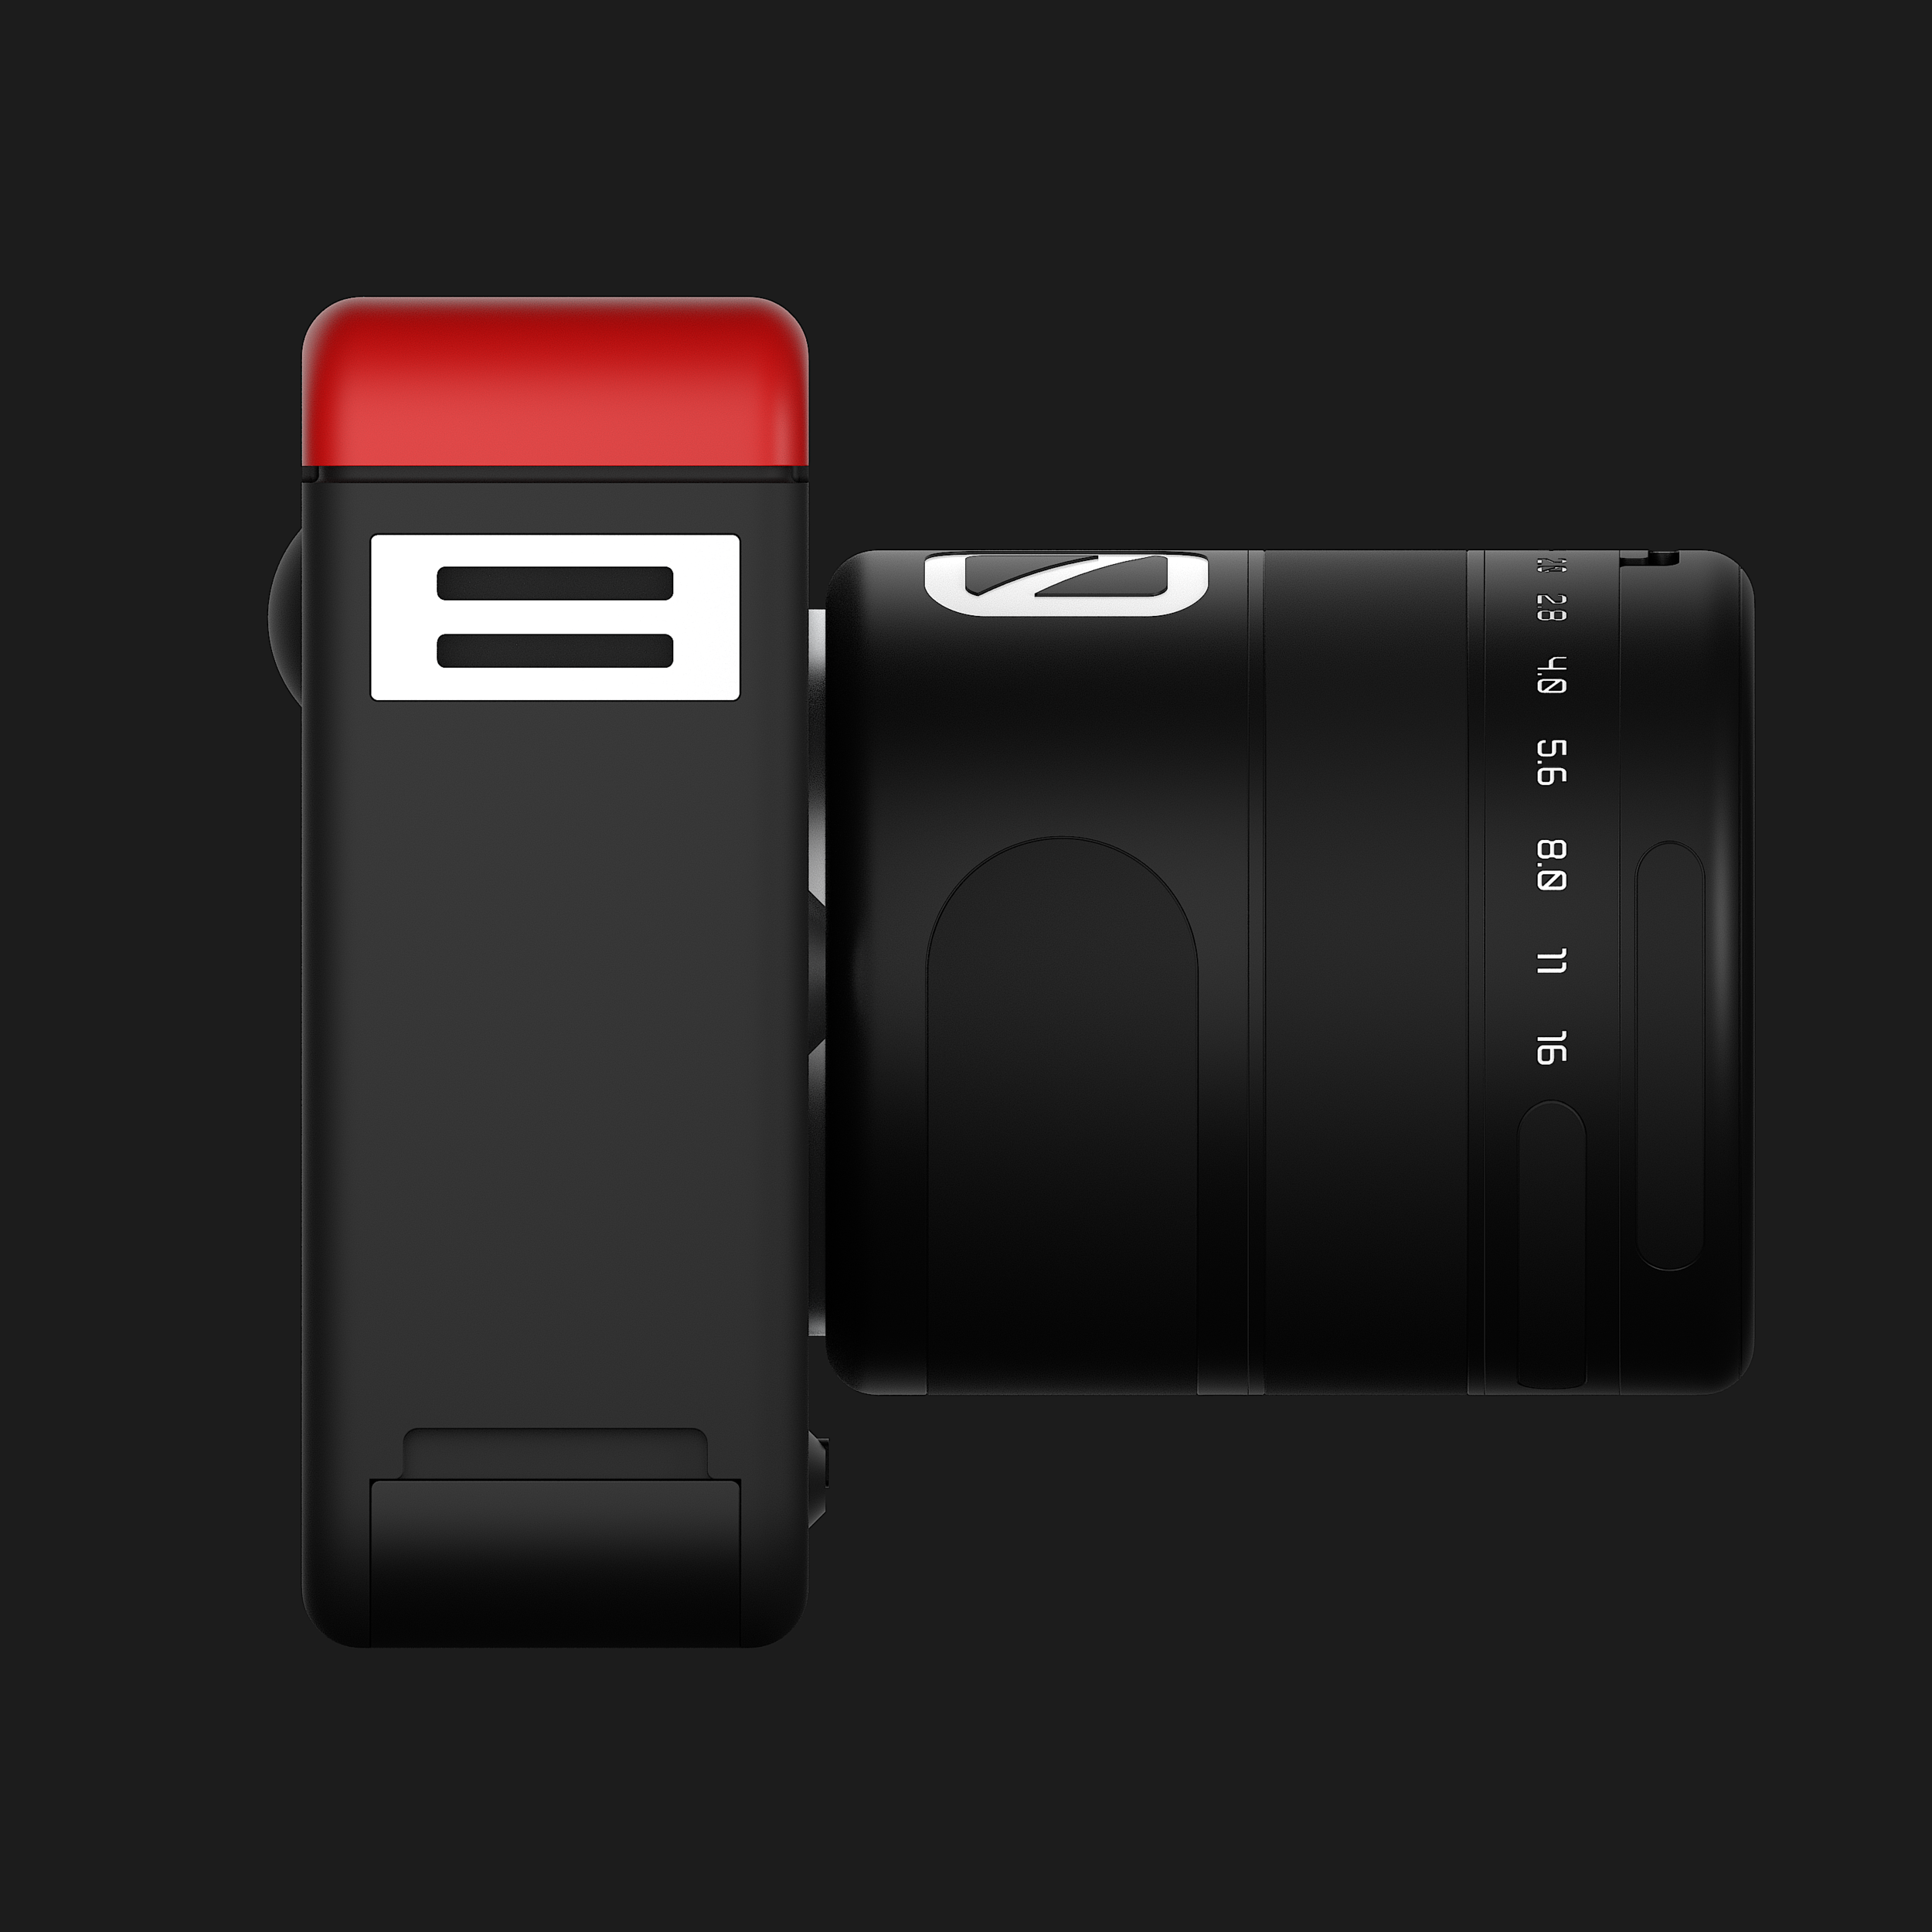 camera3.png